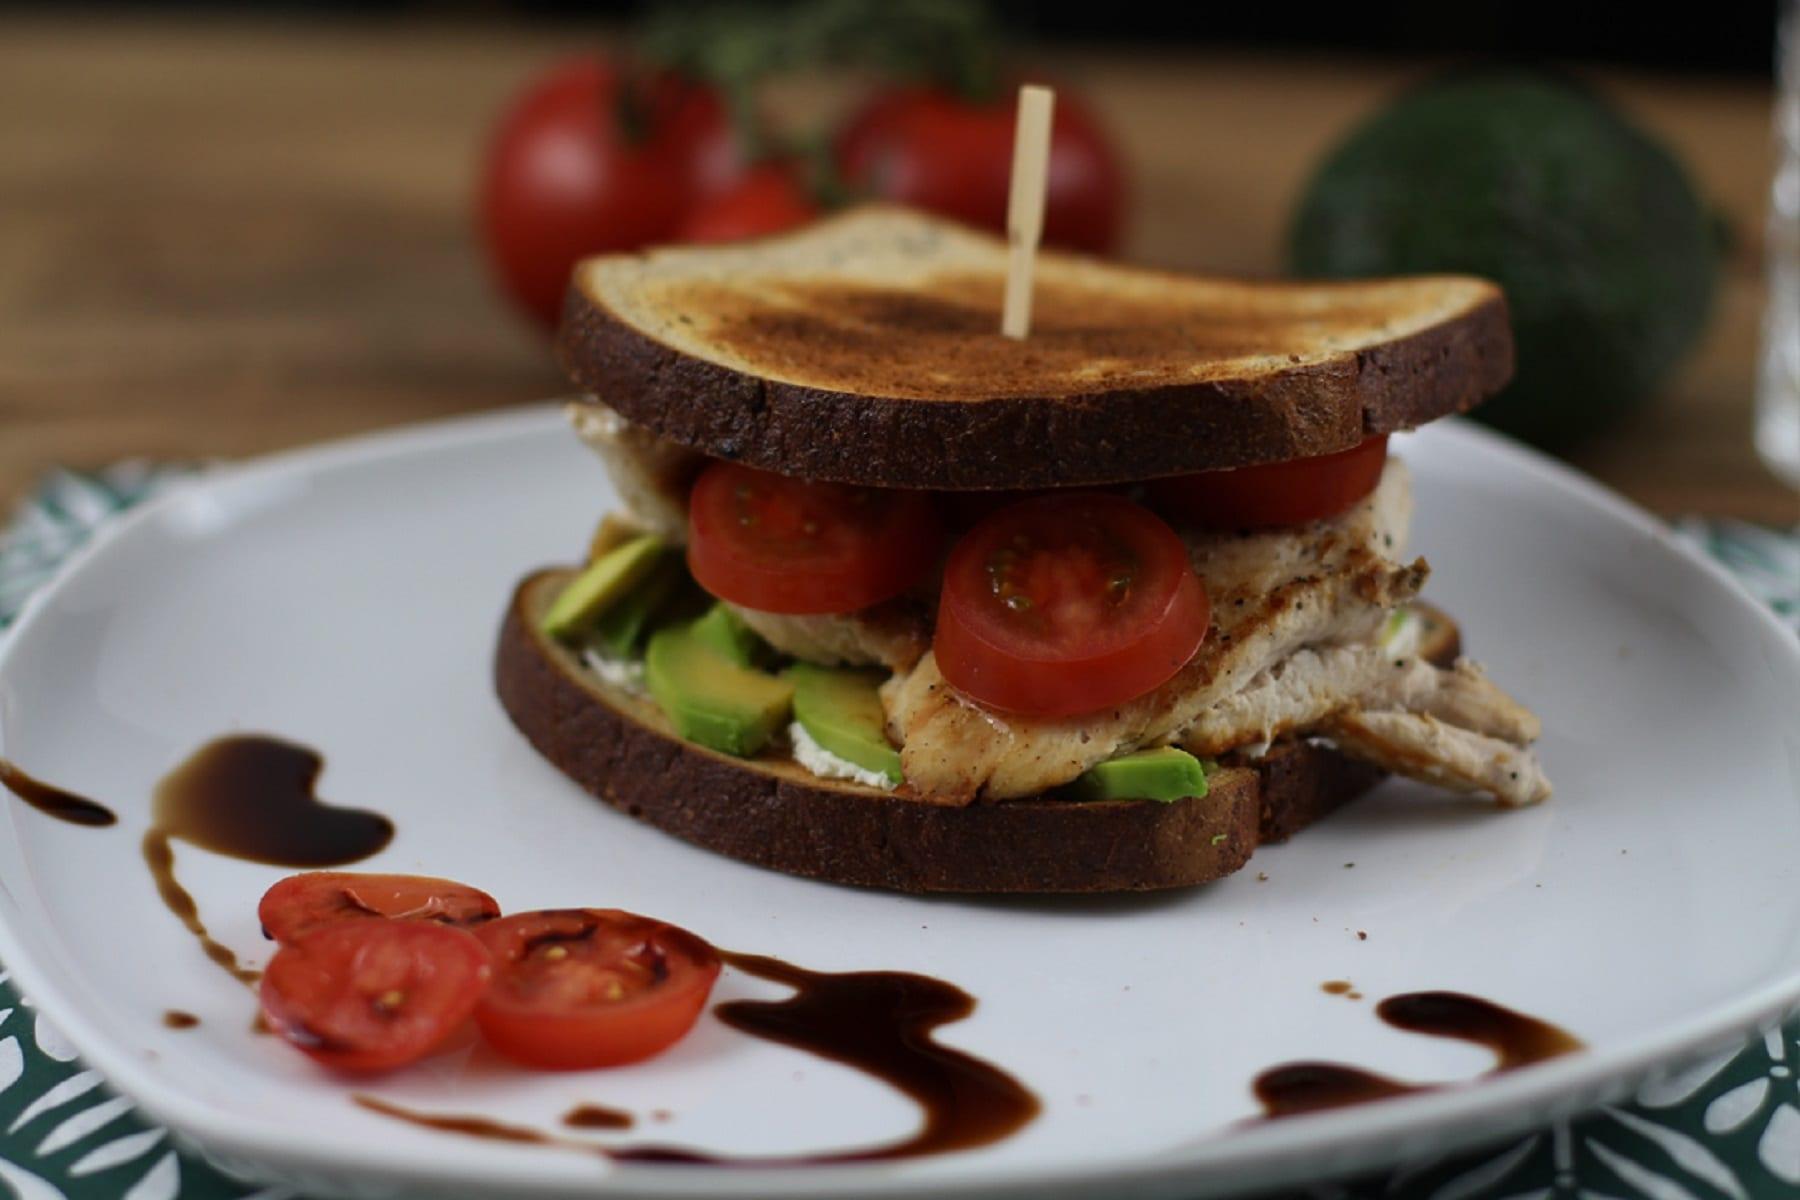 Avocado-Hähnchen Sandwich